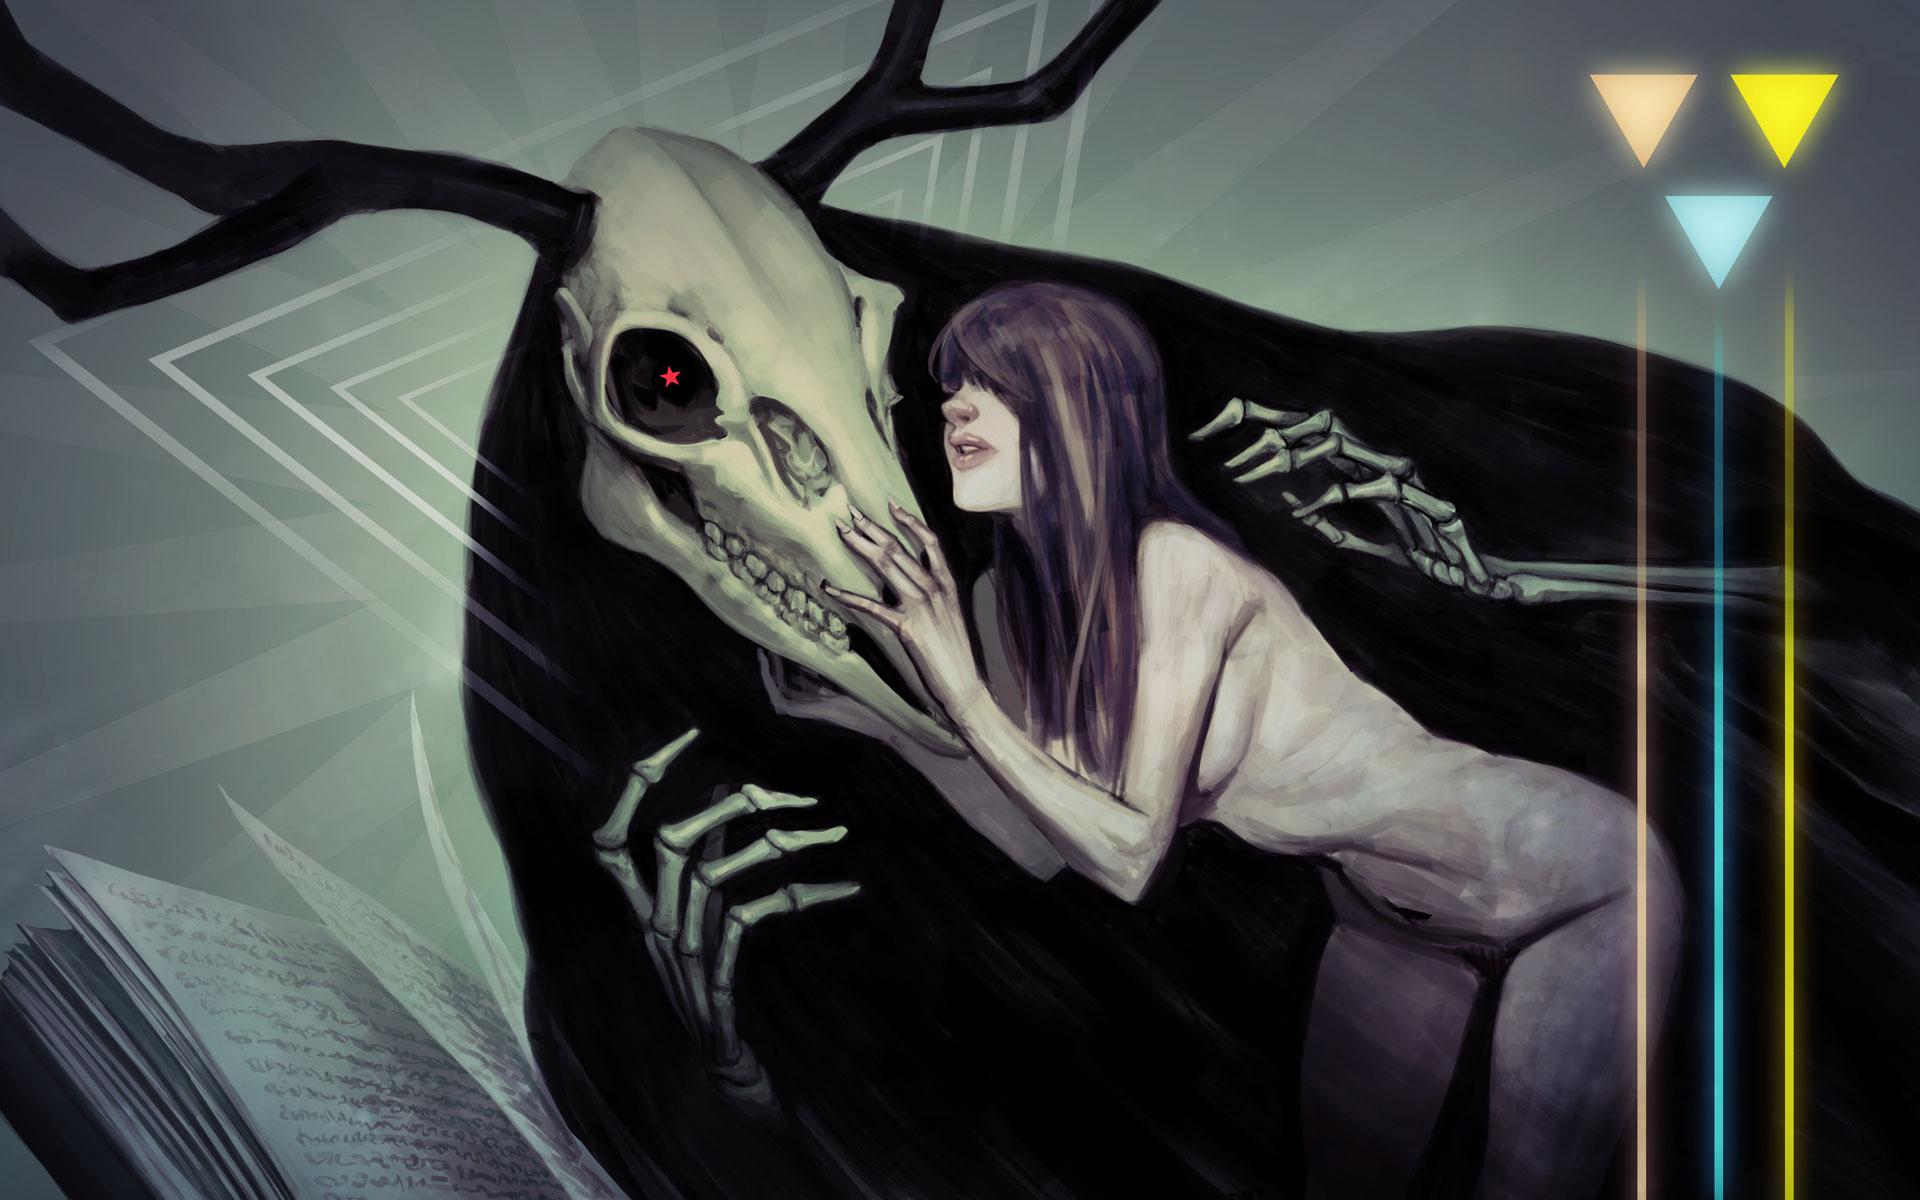 Sword And Sworcery EP: Depths of Mingi Taw by qiqo